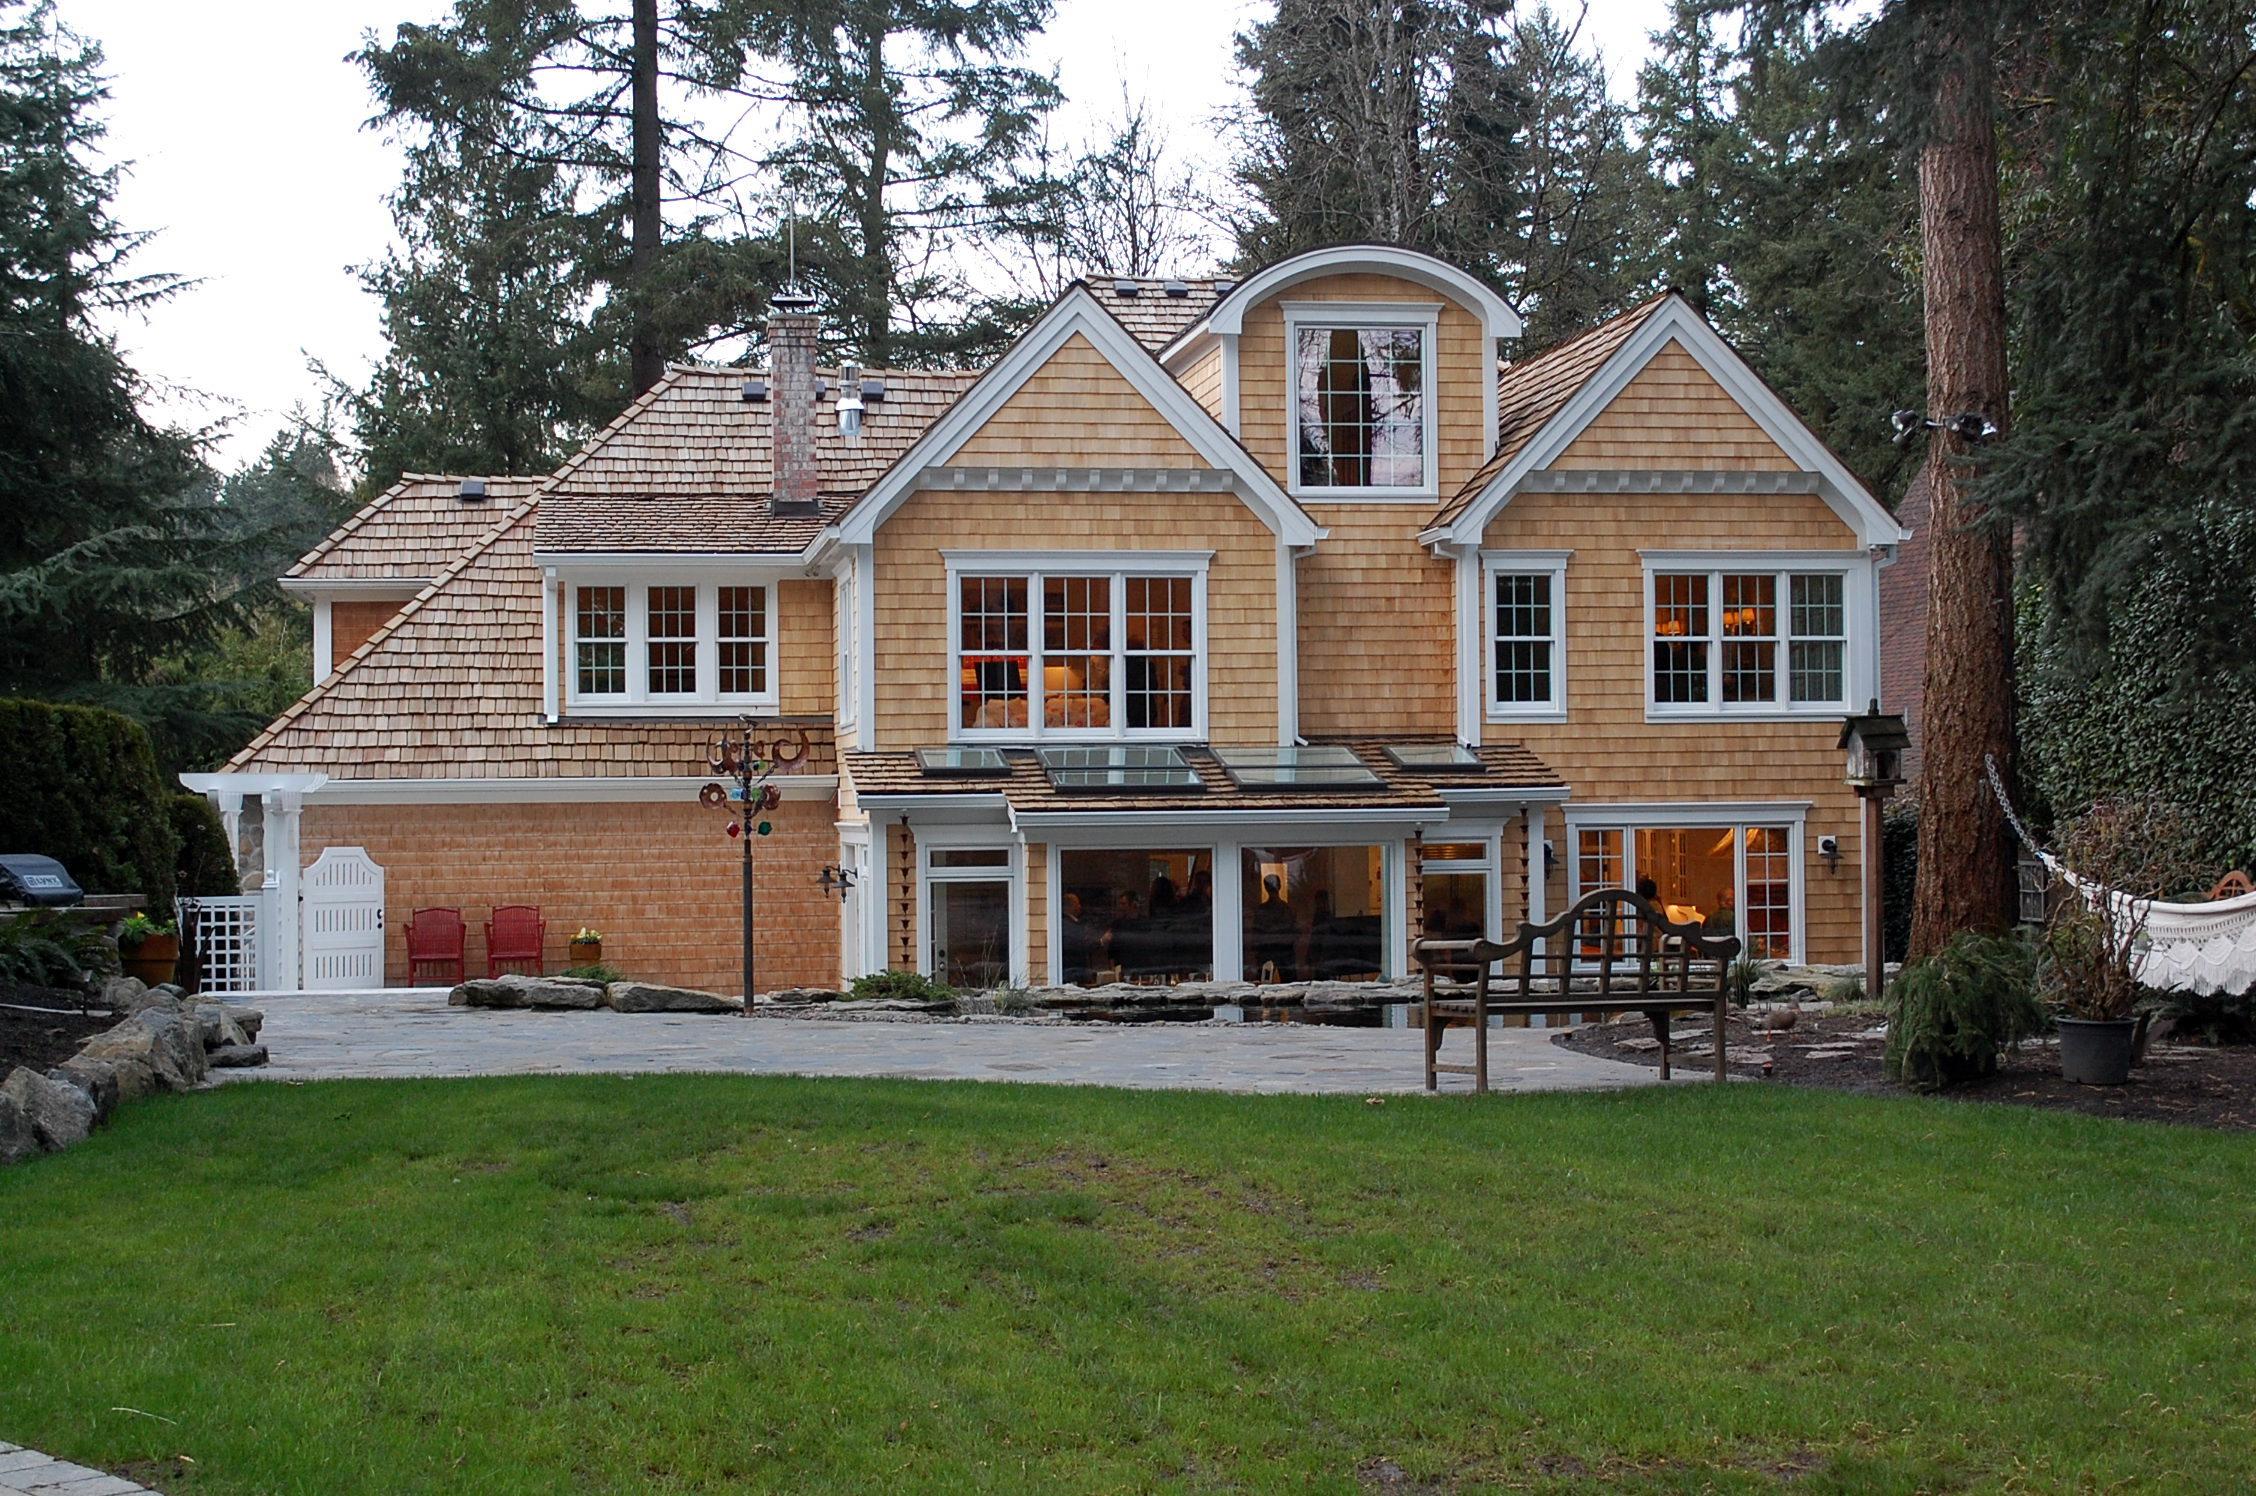 Portland home remodel tour lake oswego home tour video for Portland home